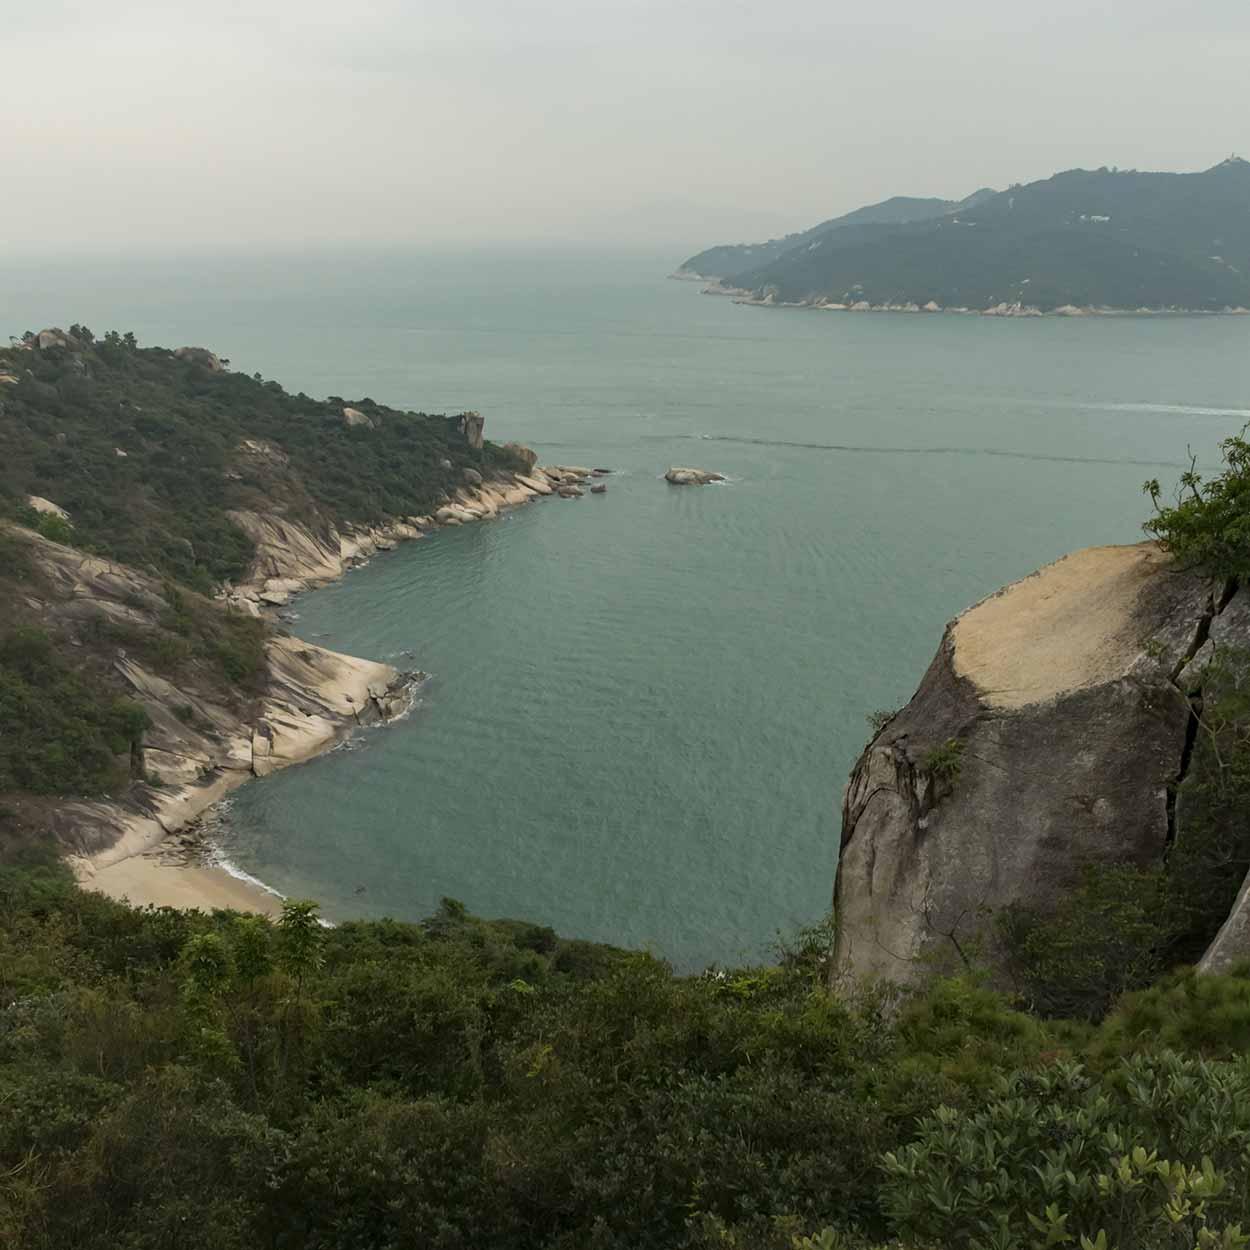 Views to Shek Kwu Chau, Chi Ma Wan Country Trail, Lantau Island, Hong Kong, China